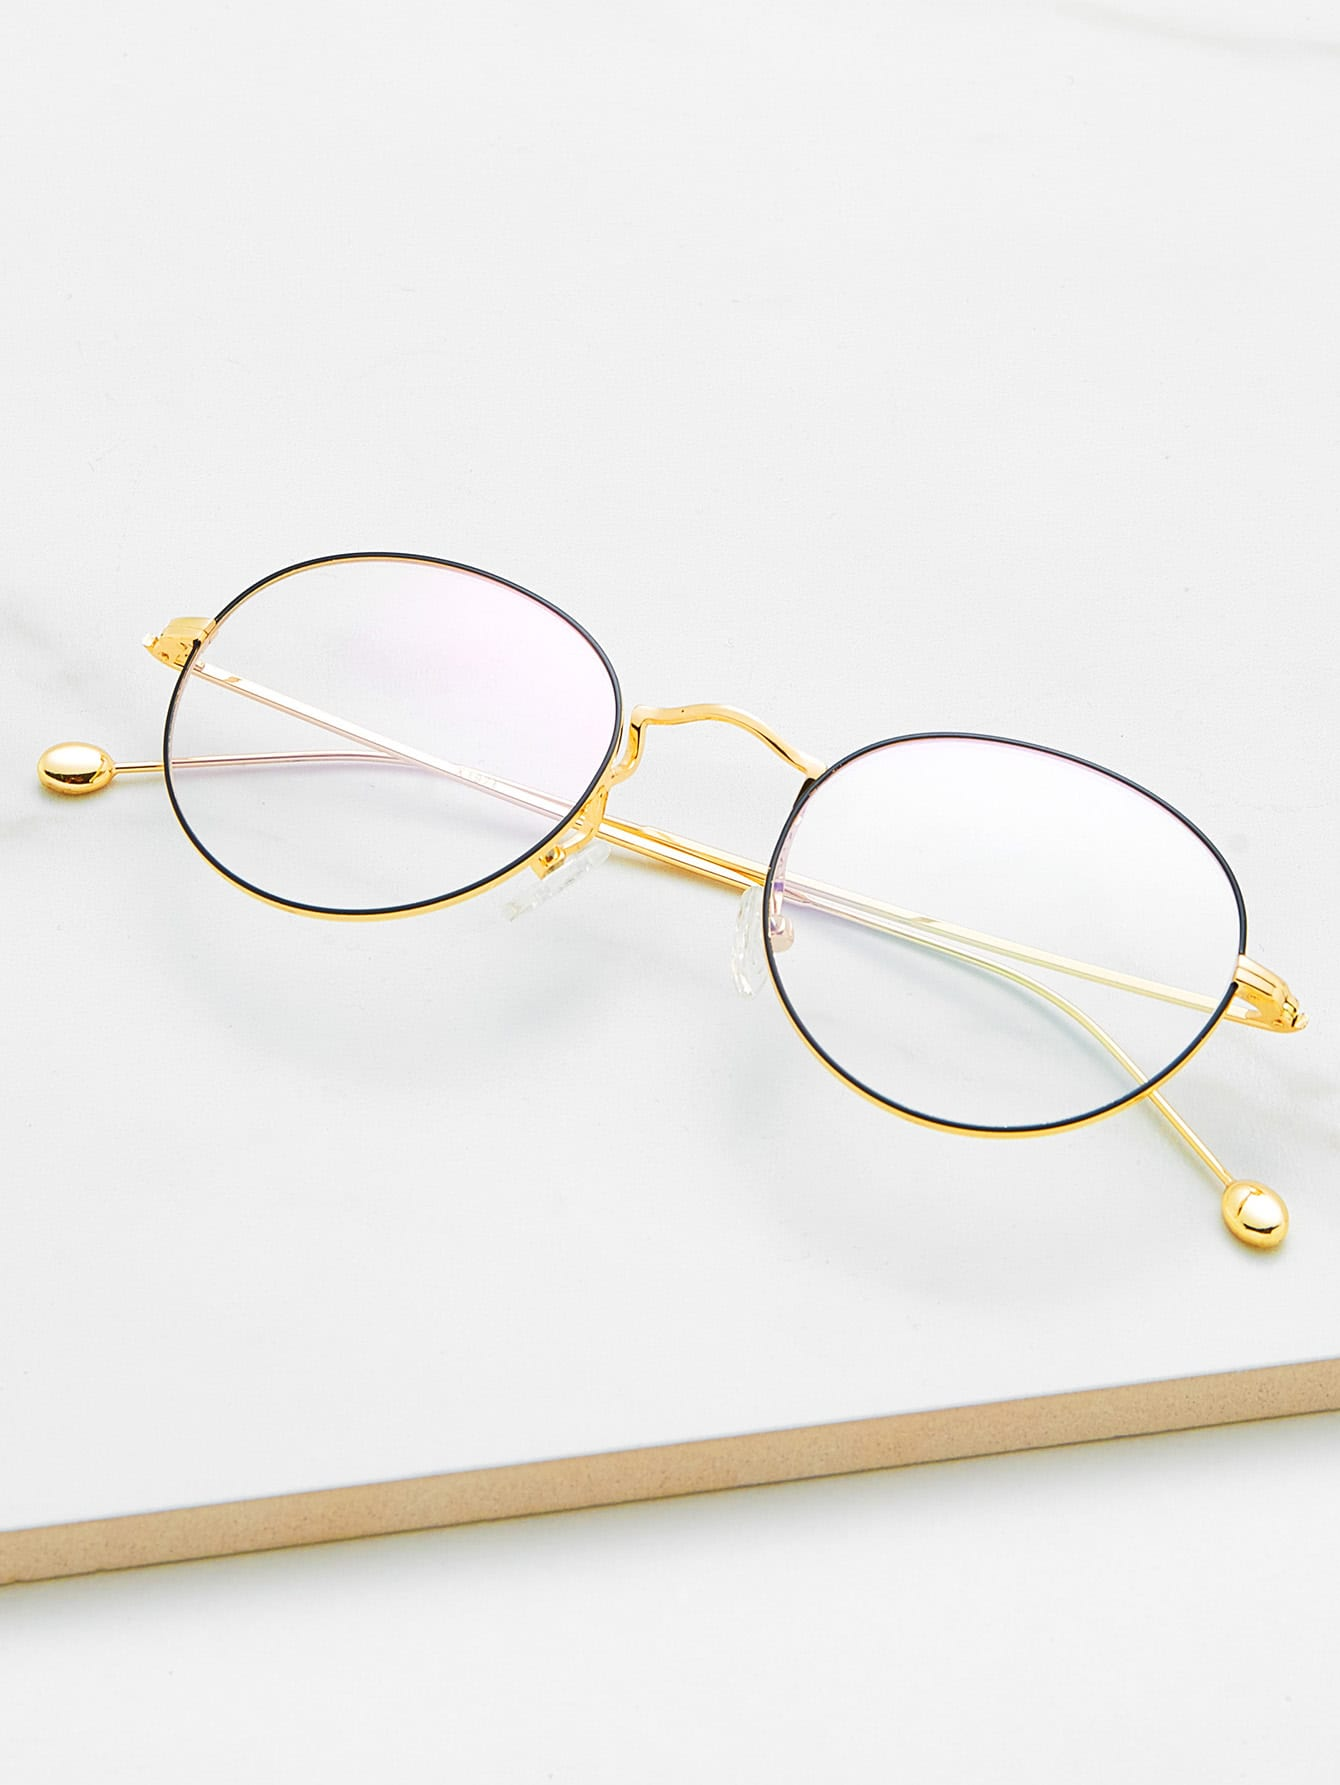 Metal frame glasses 4334677 - fvnm.info